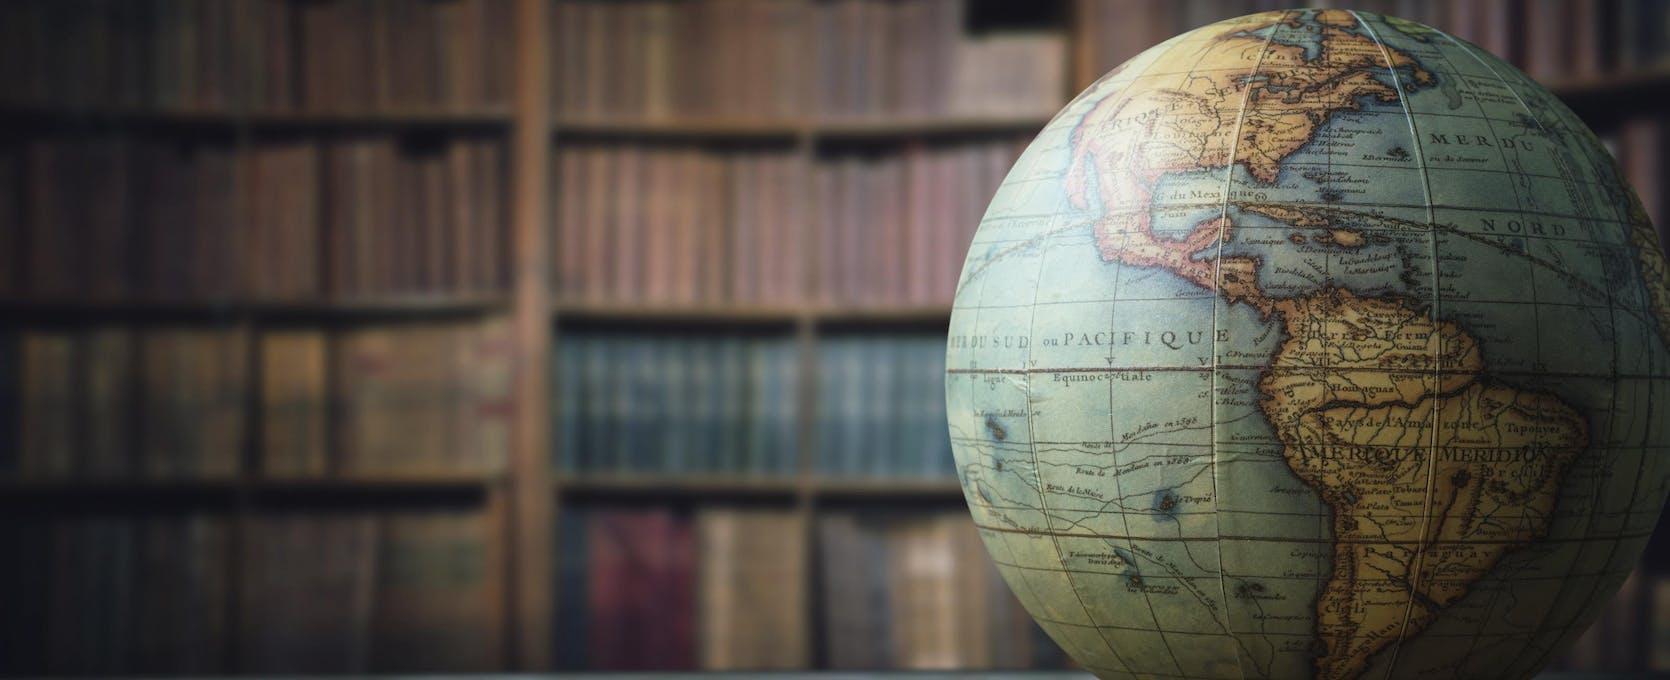 Bookshelf and globe